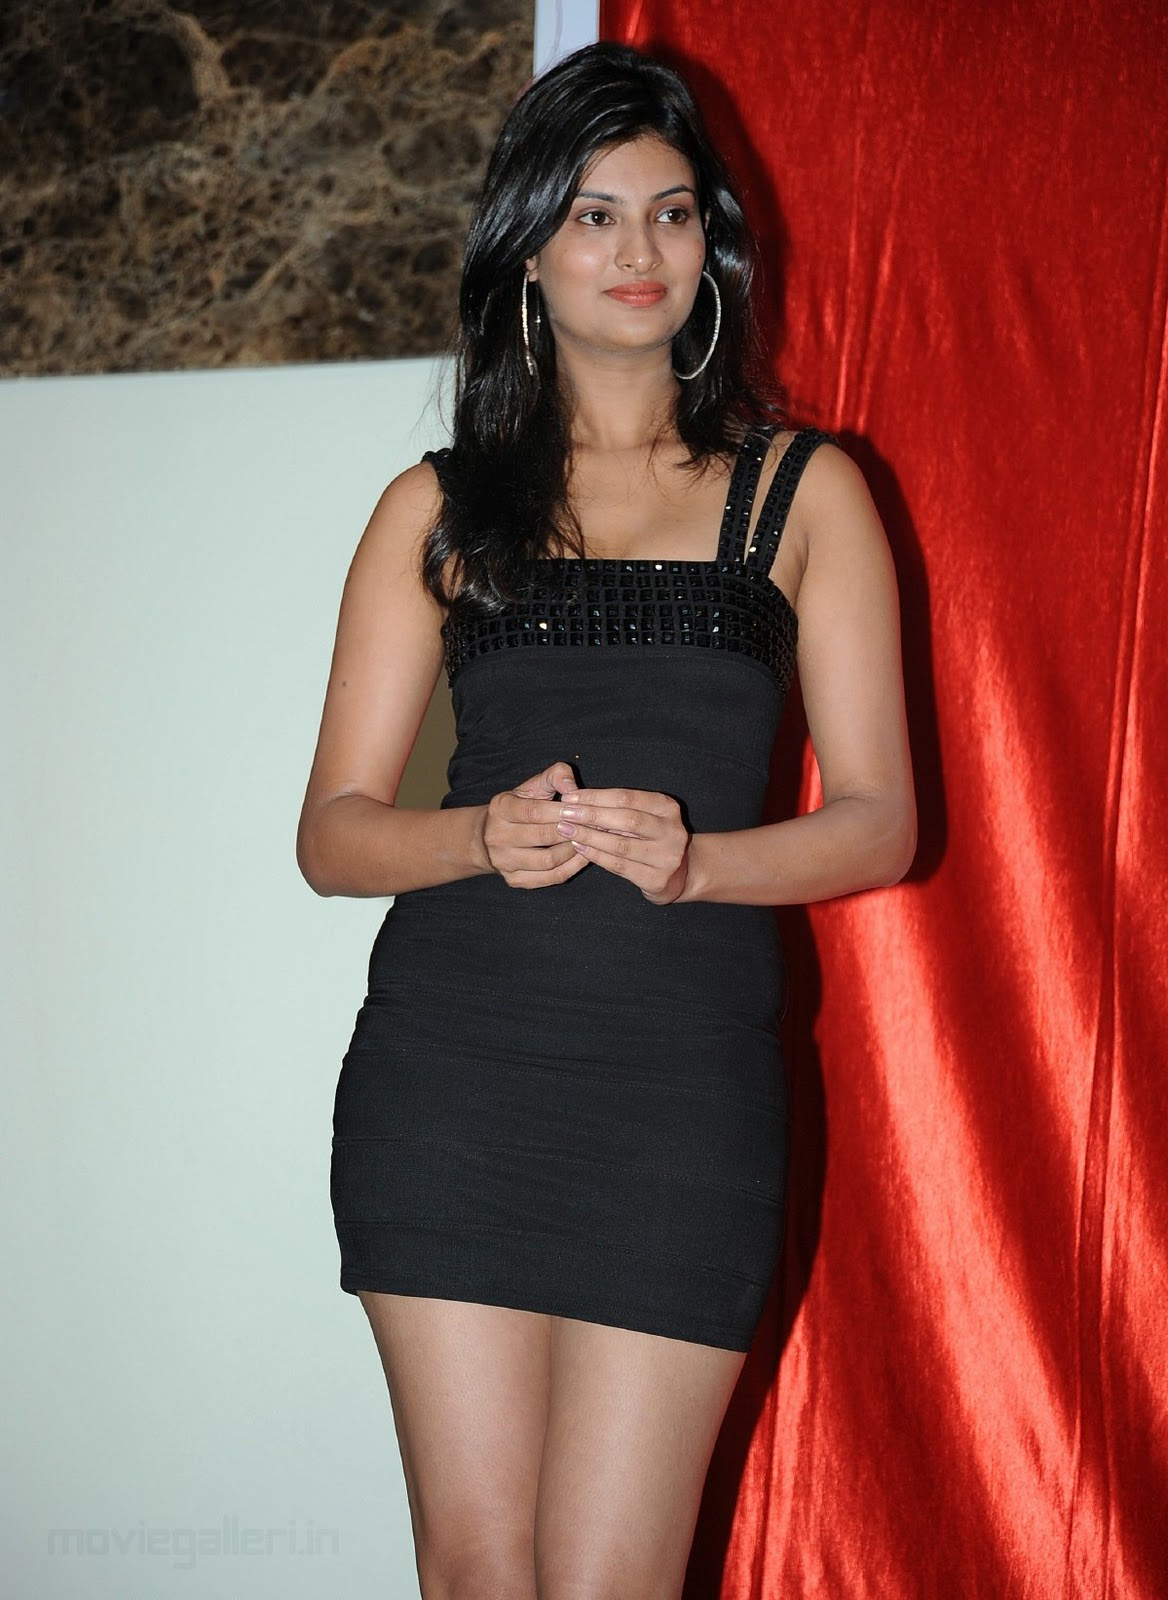 http://1.bp.blogspot.com/_6Vr9b9OoZno/TODletLXnpI/AAAAAAAAEDQ/o6V5ThDaPZg/s1600/sayali_bhagat_latest_black_dress_images_08.jpg